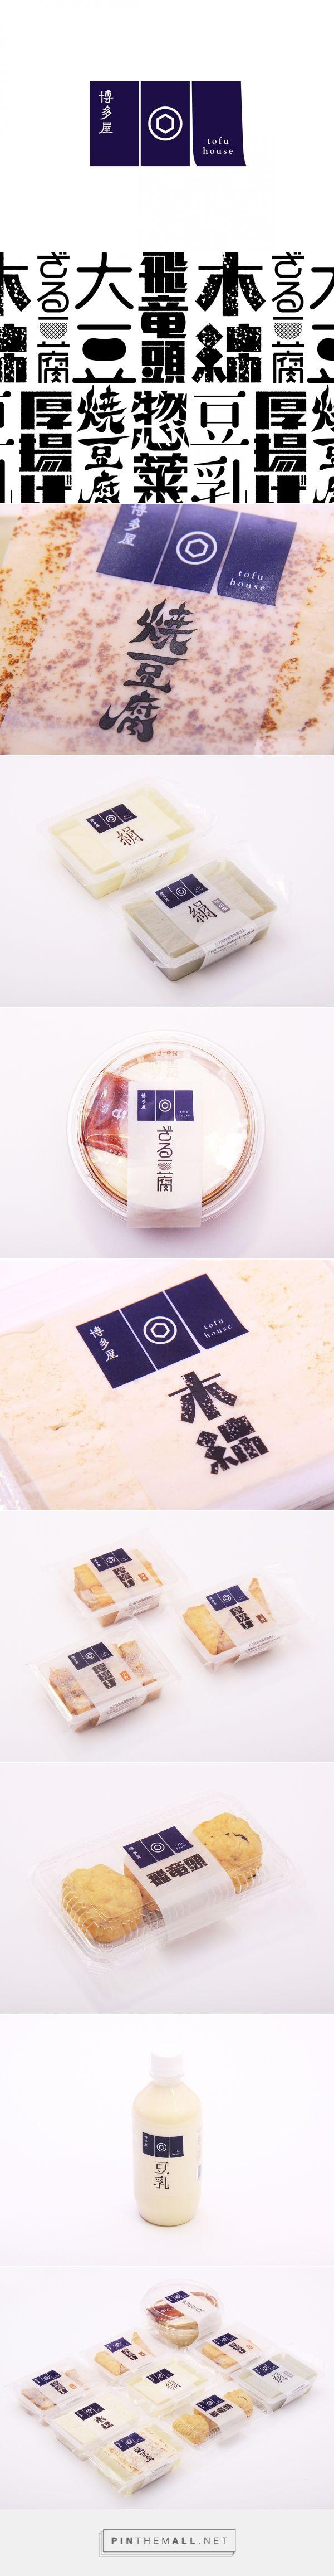 Tofu House packaging design by BLOW HK - http://www.packagingoftheworld.com/2016/10/tofu-house.html